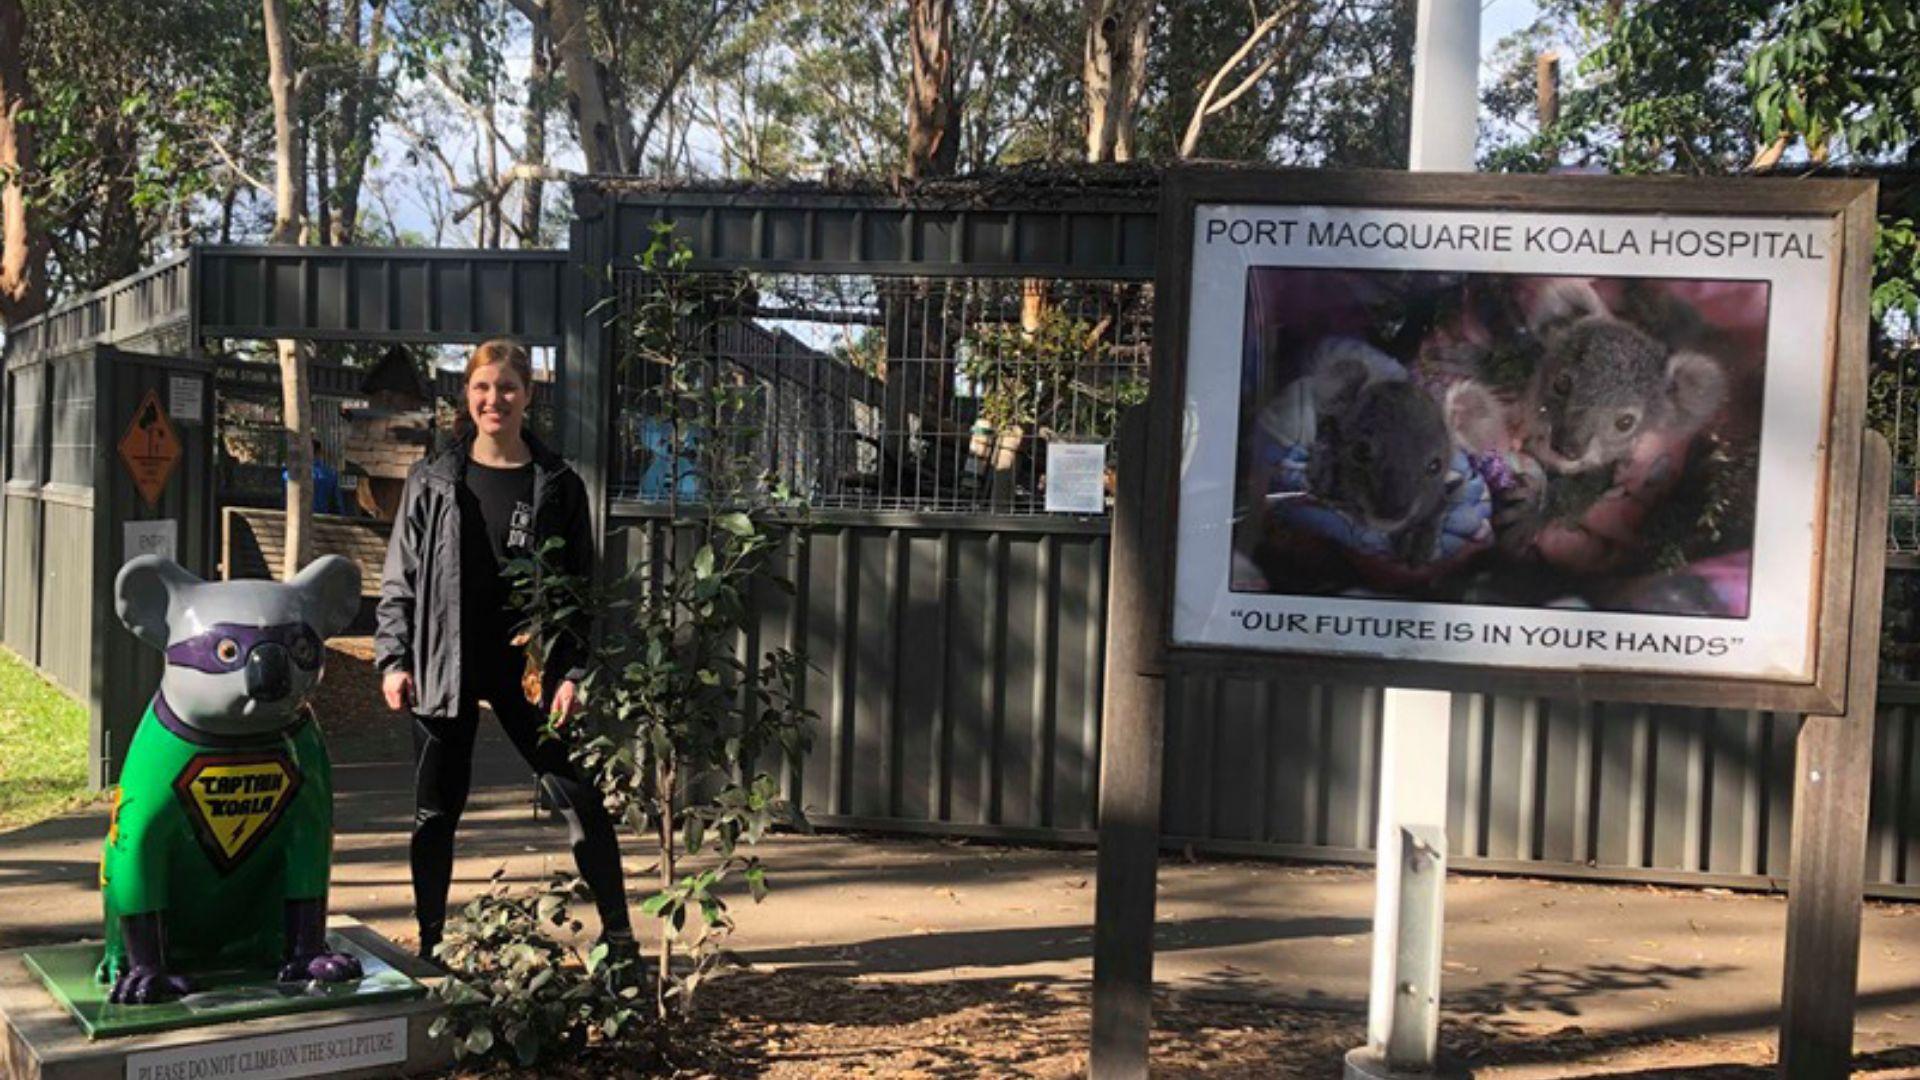 Students' ideas help Koala Hospital in Port Macquarie